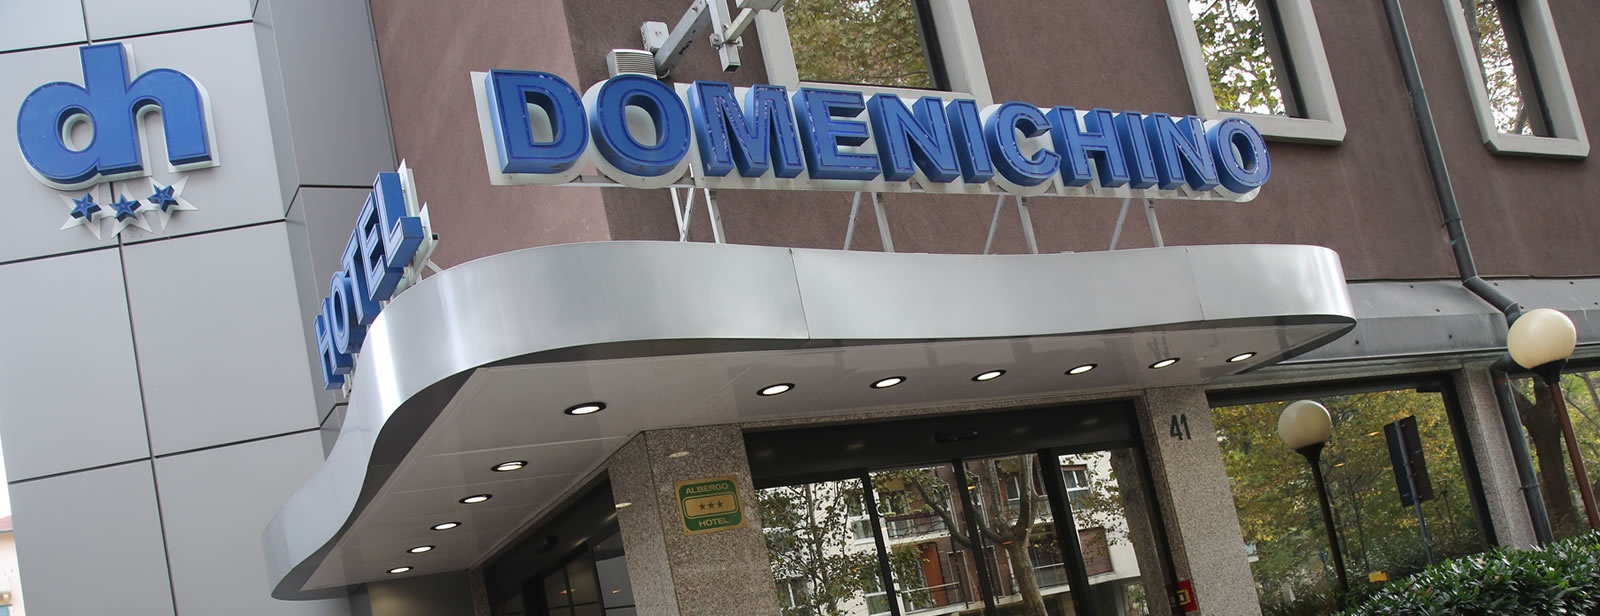 3 star hotels milan center hotel milan hotel for Hotel domenichino milano